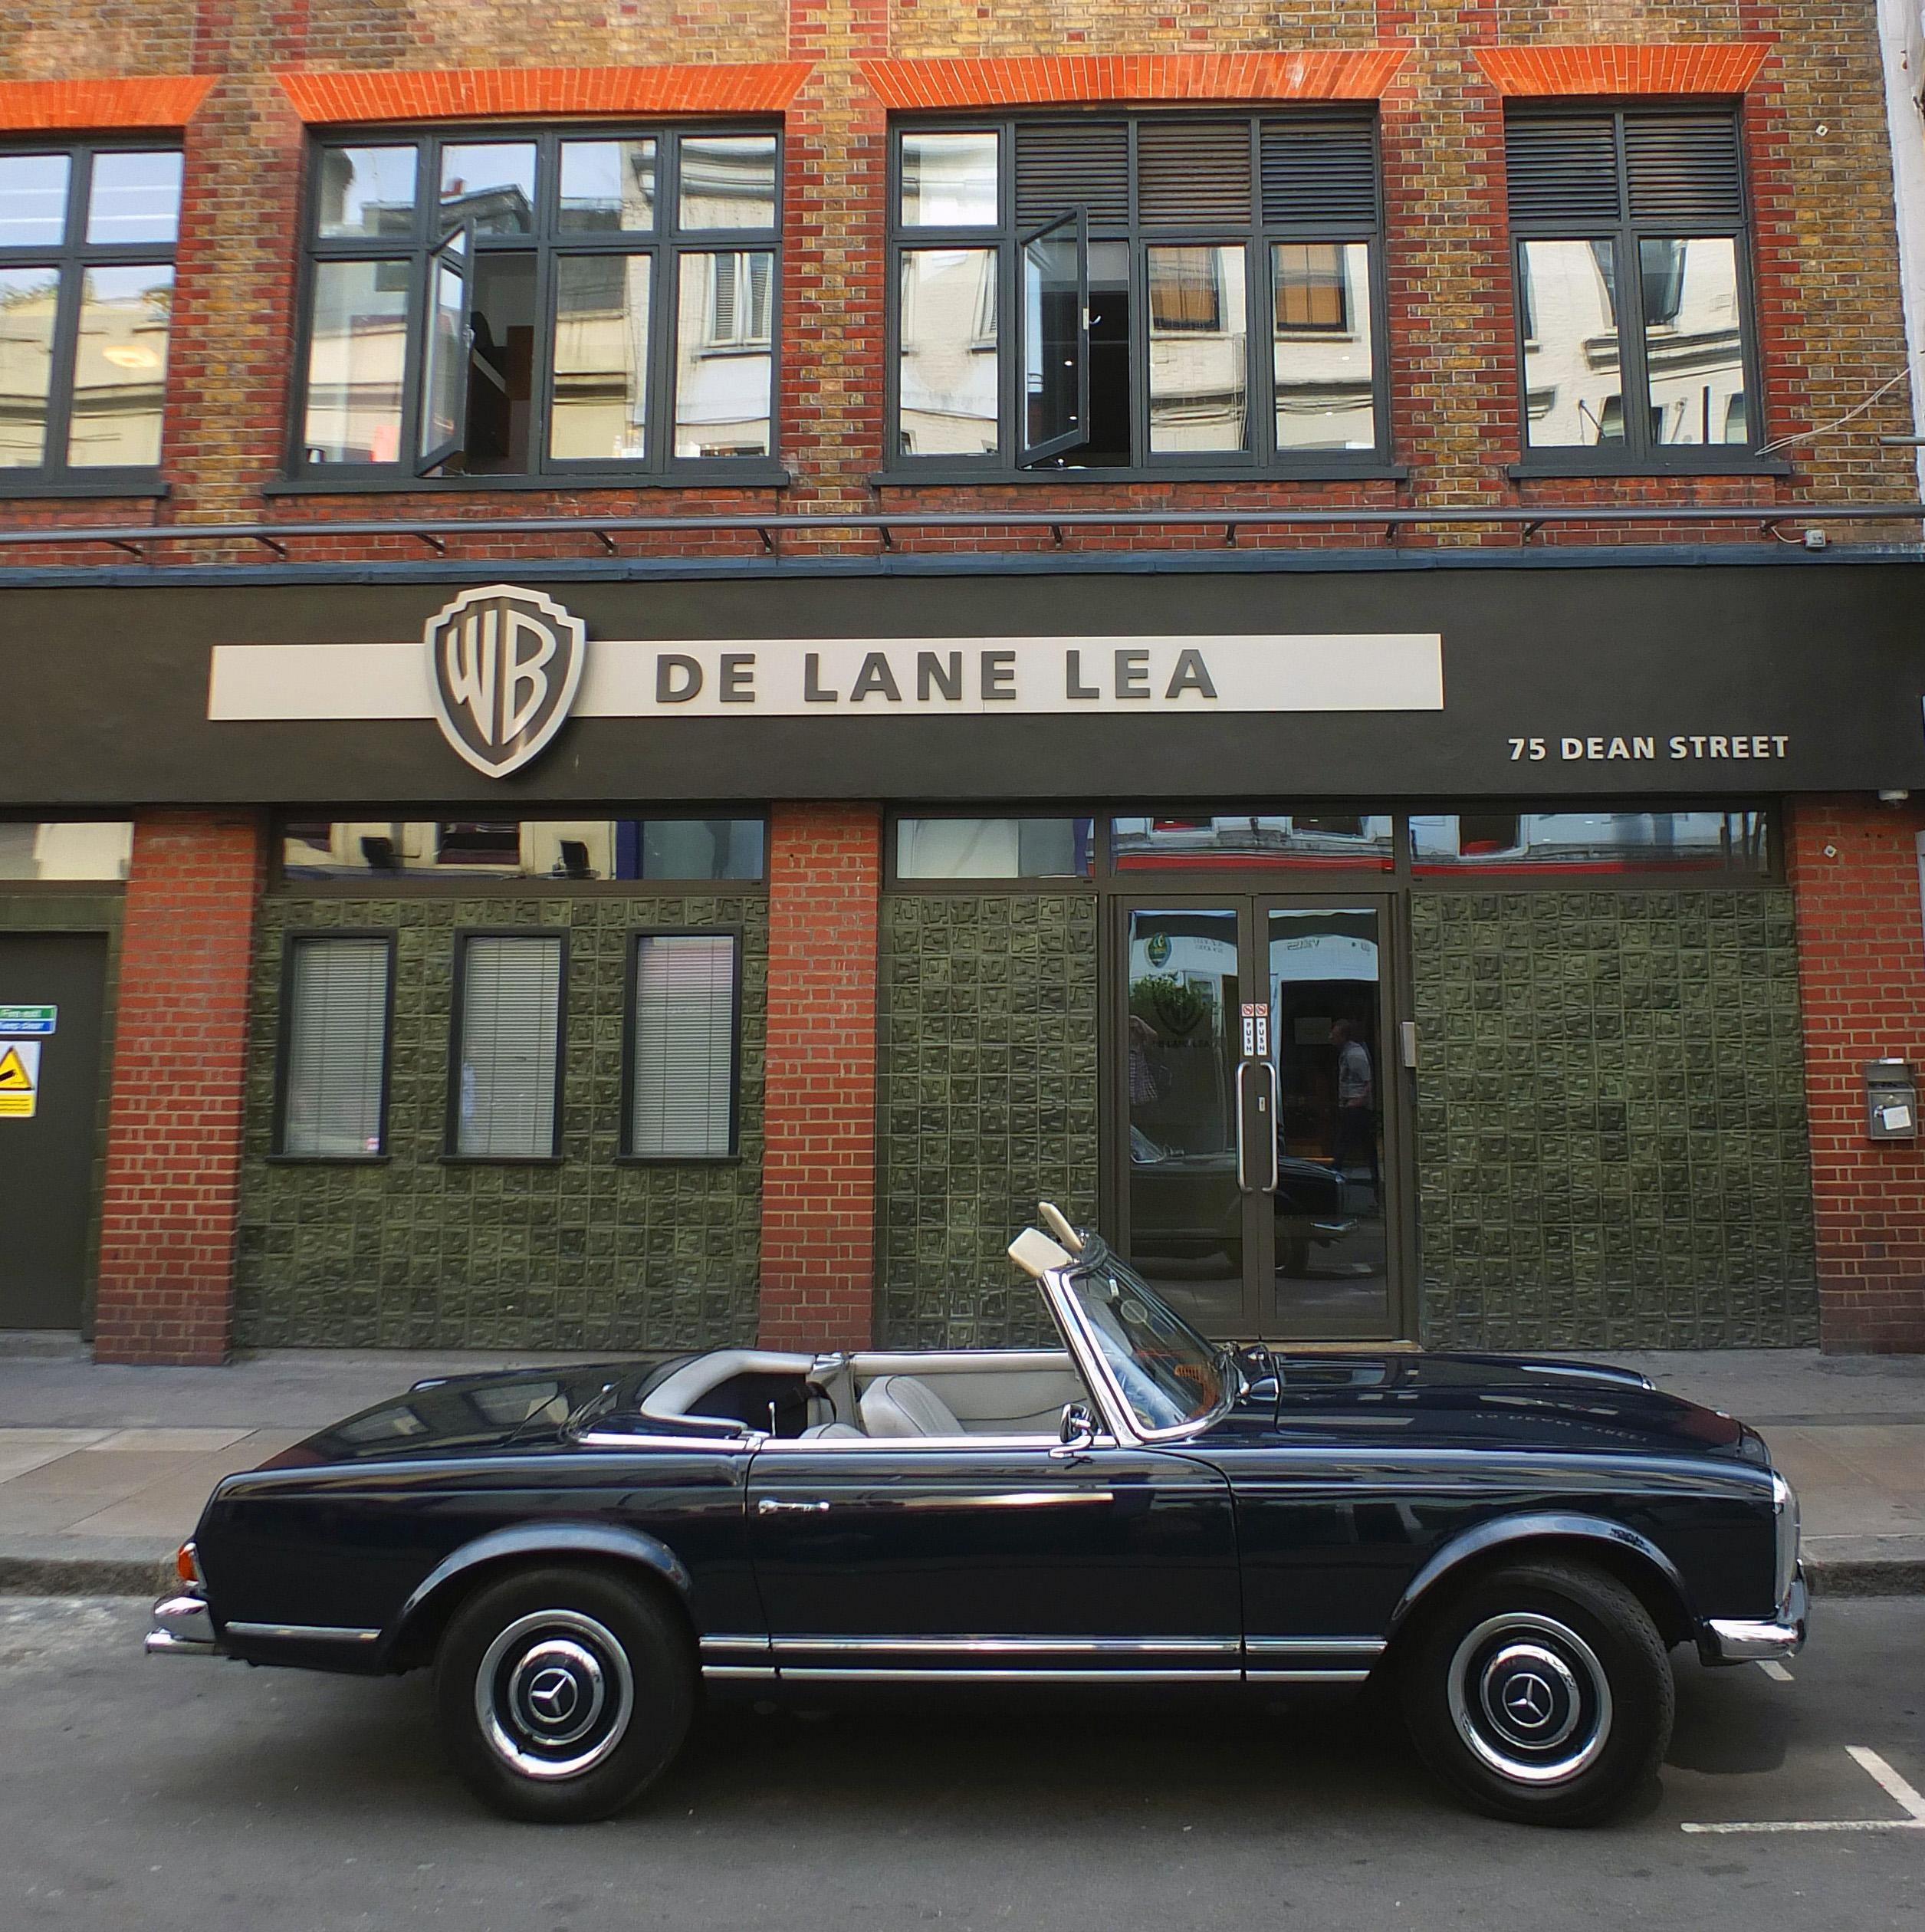 The current De Lane Lea studio, Dean Street